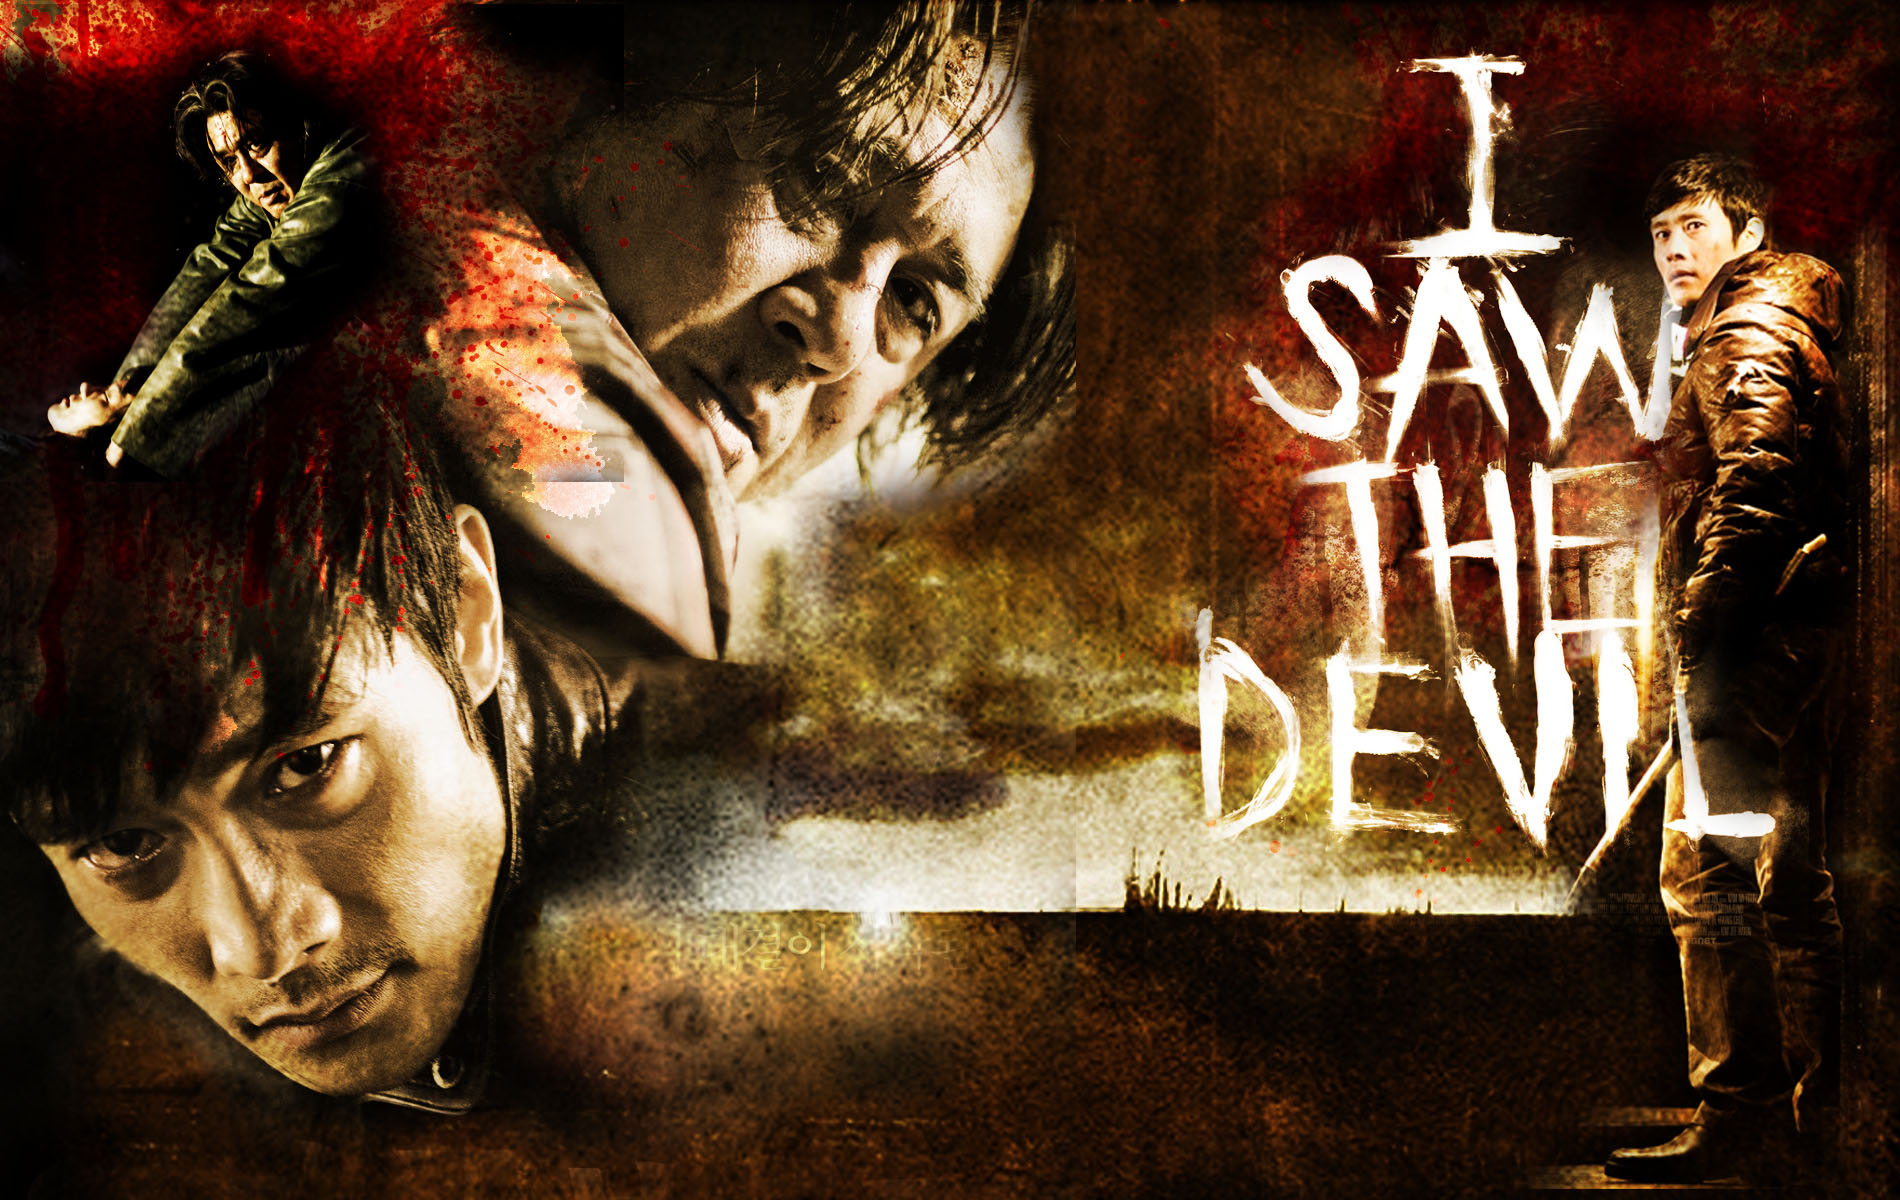 I SAW THE DEVIL wallpaper by rodolforever